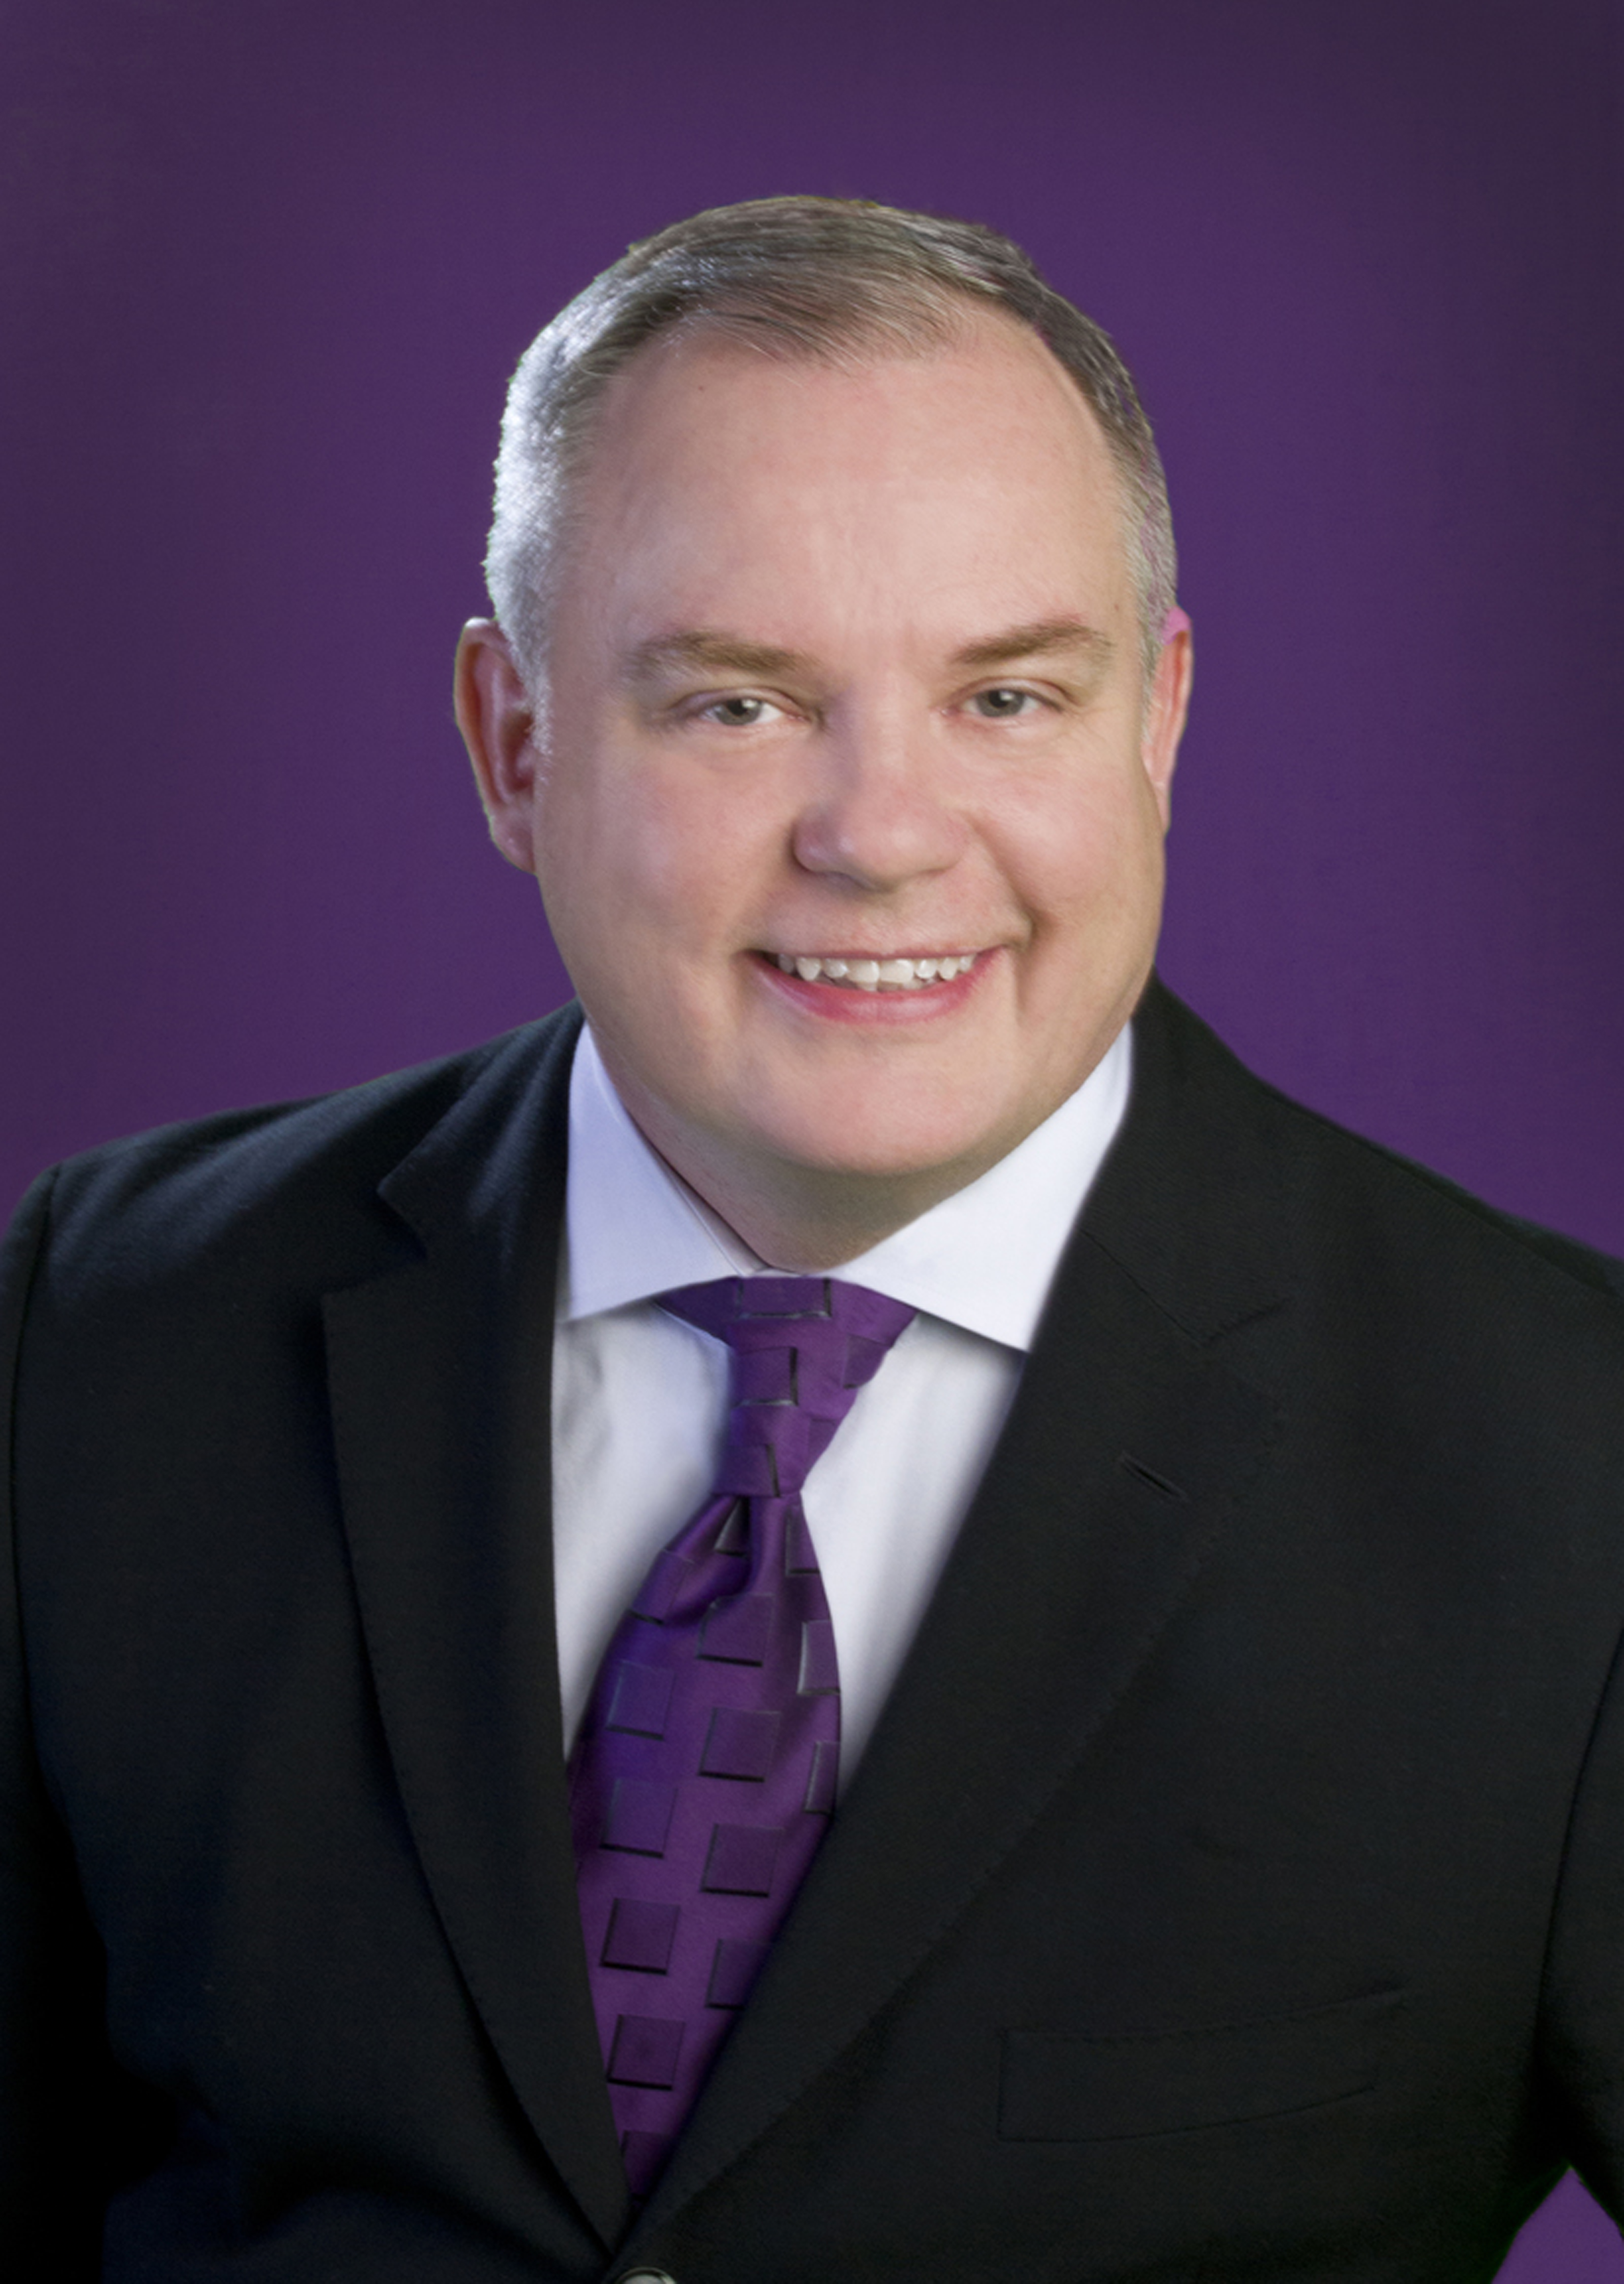 Business Profile Portraits 100 (2)